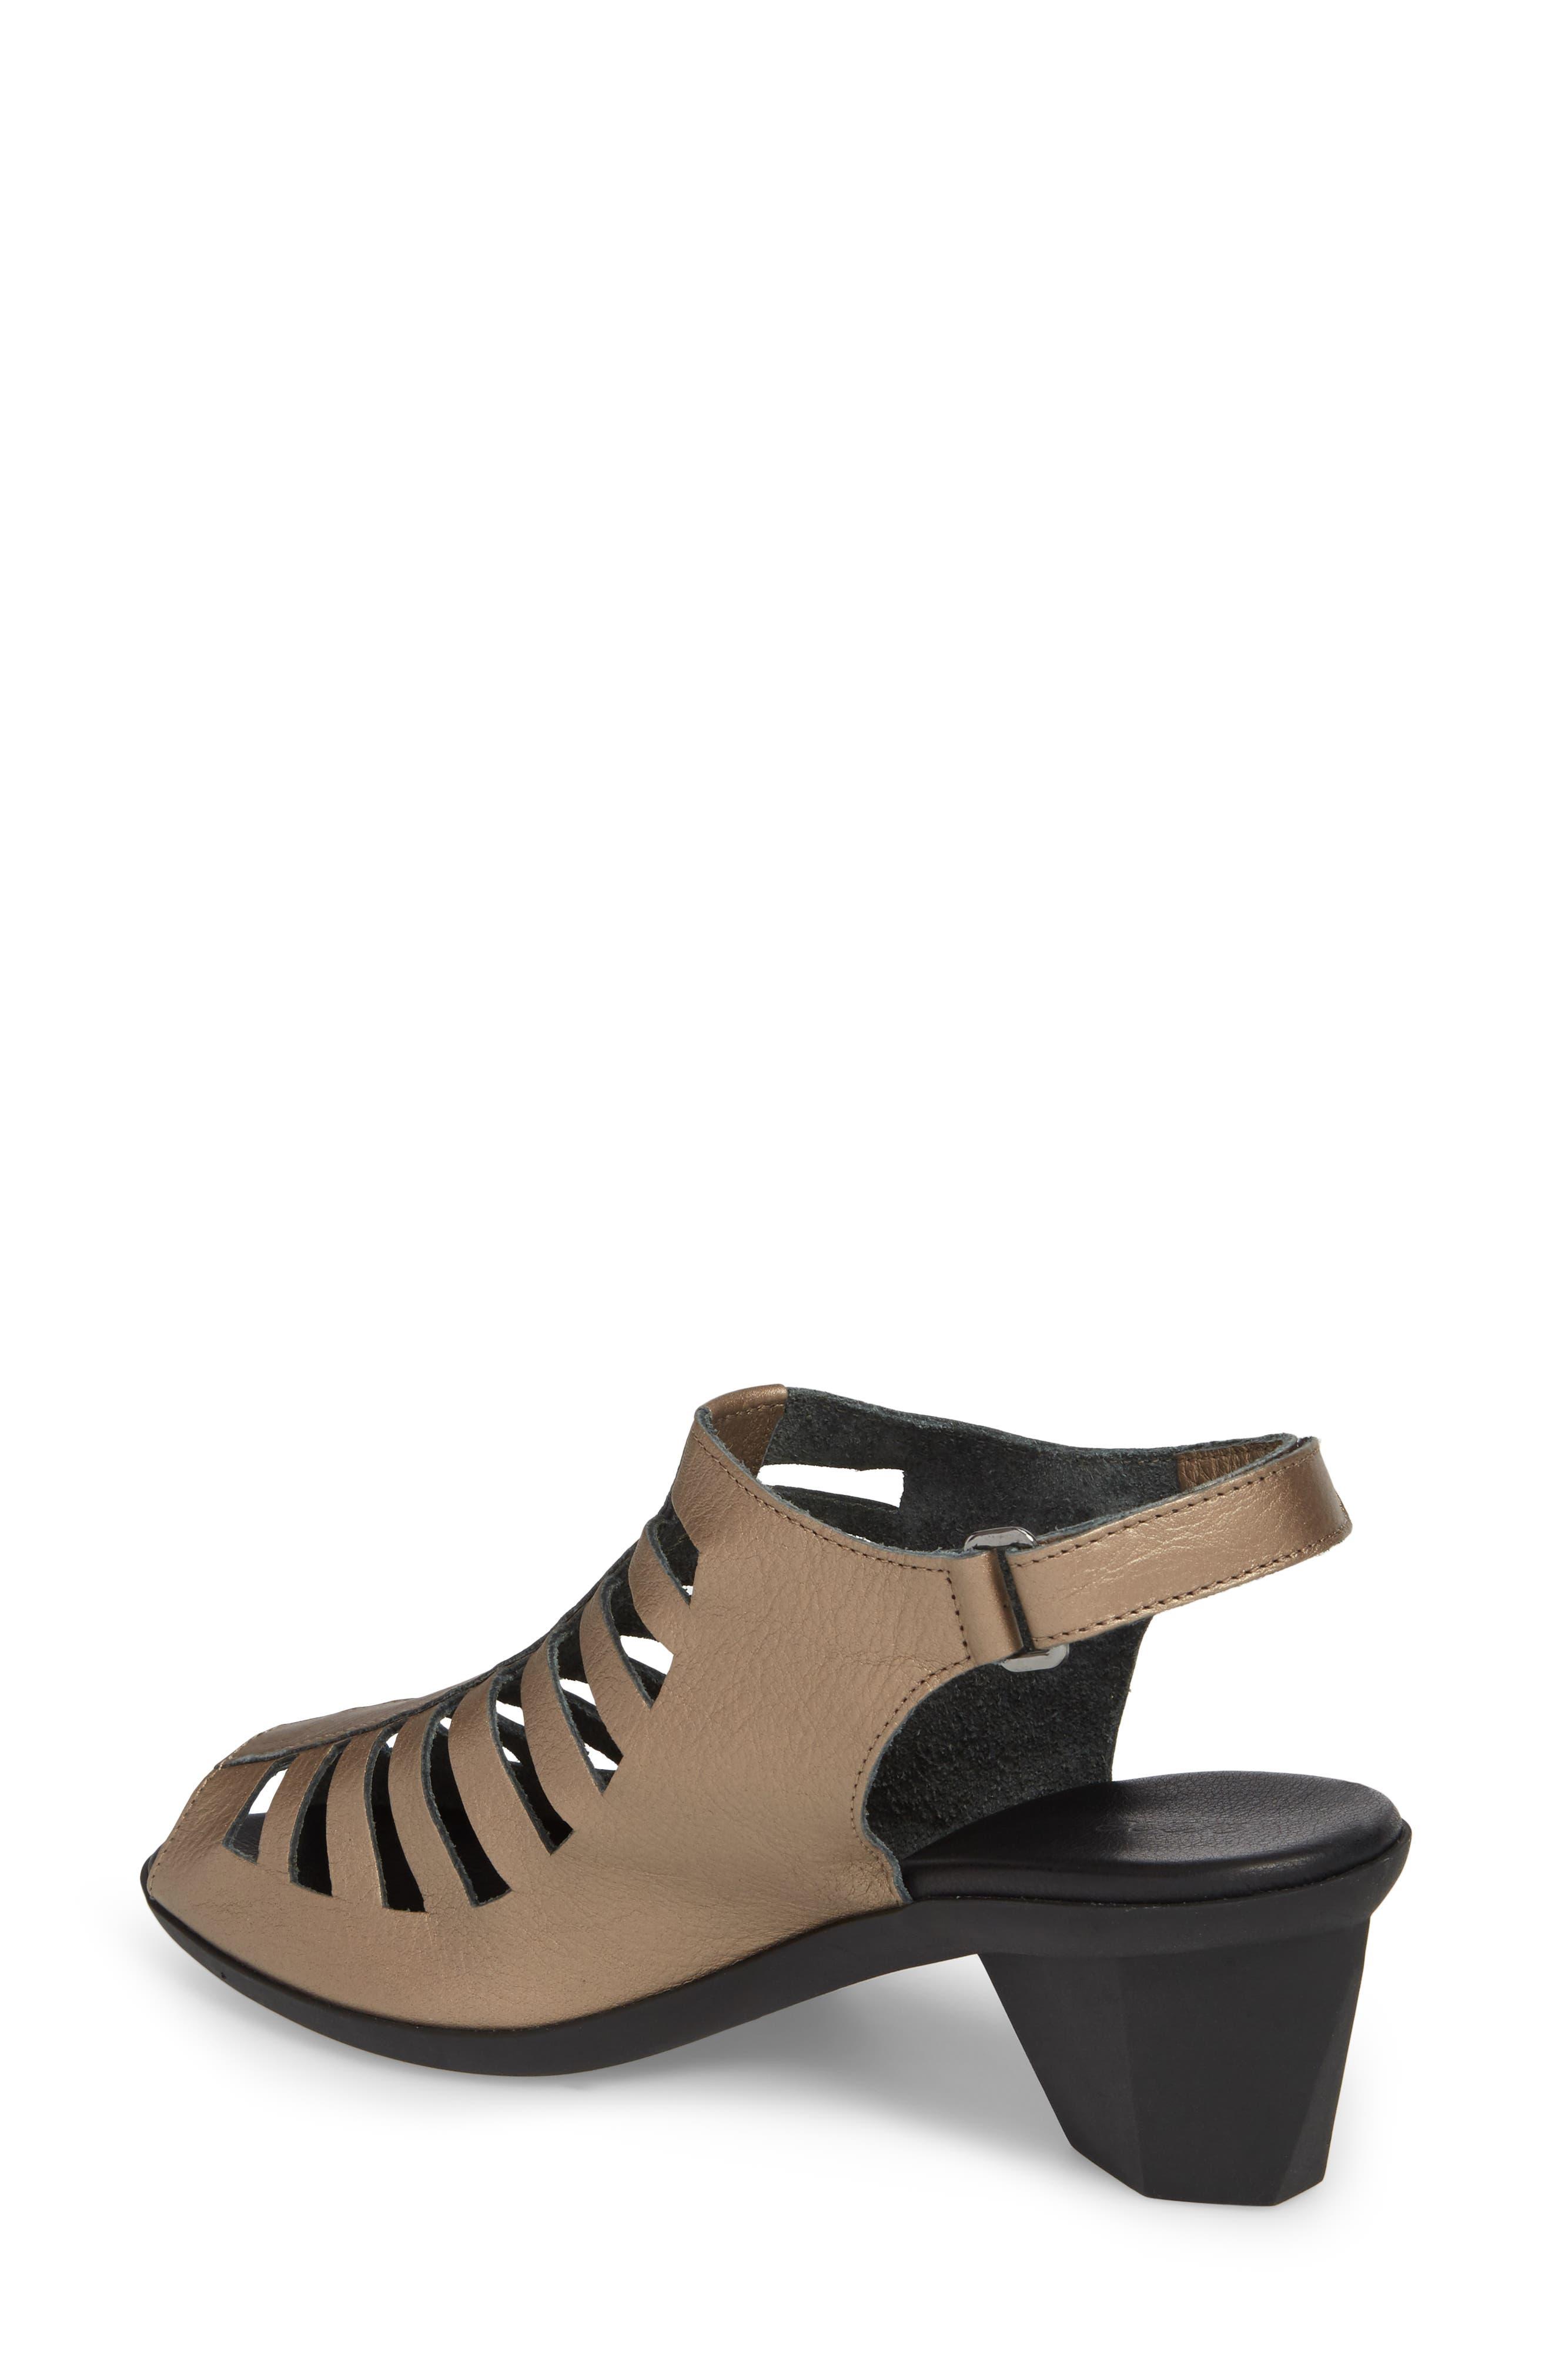 Enexor Sandal,                             Alternate thumbnail 2, color,                             Moon/ Noir Leather